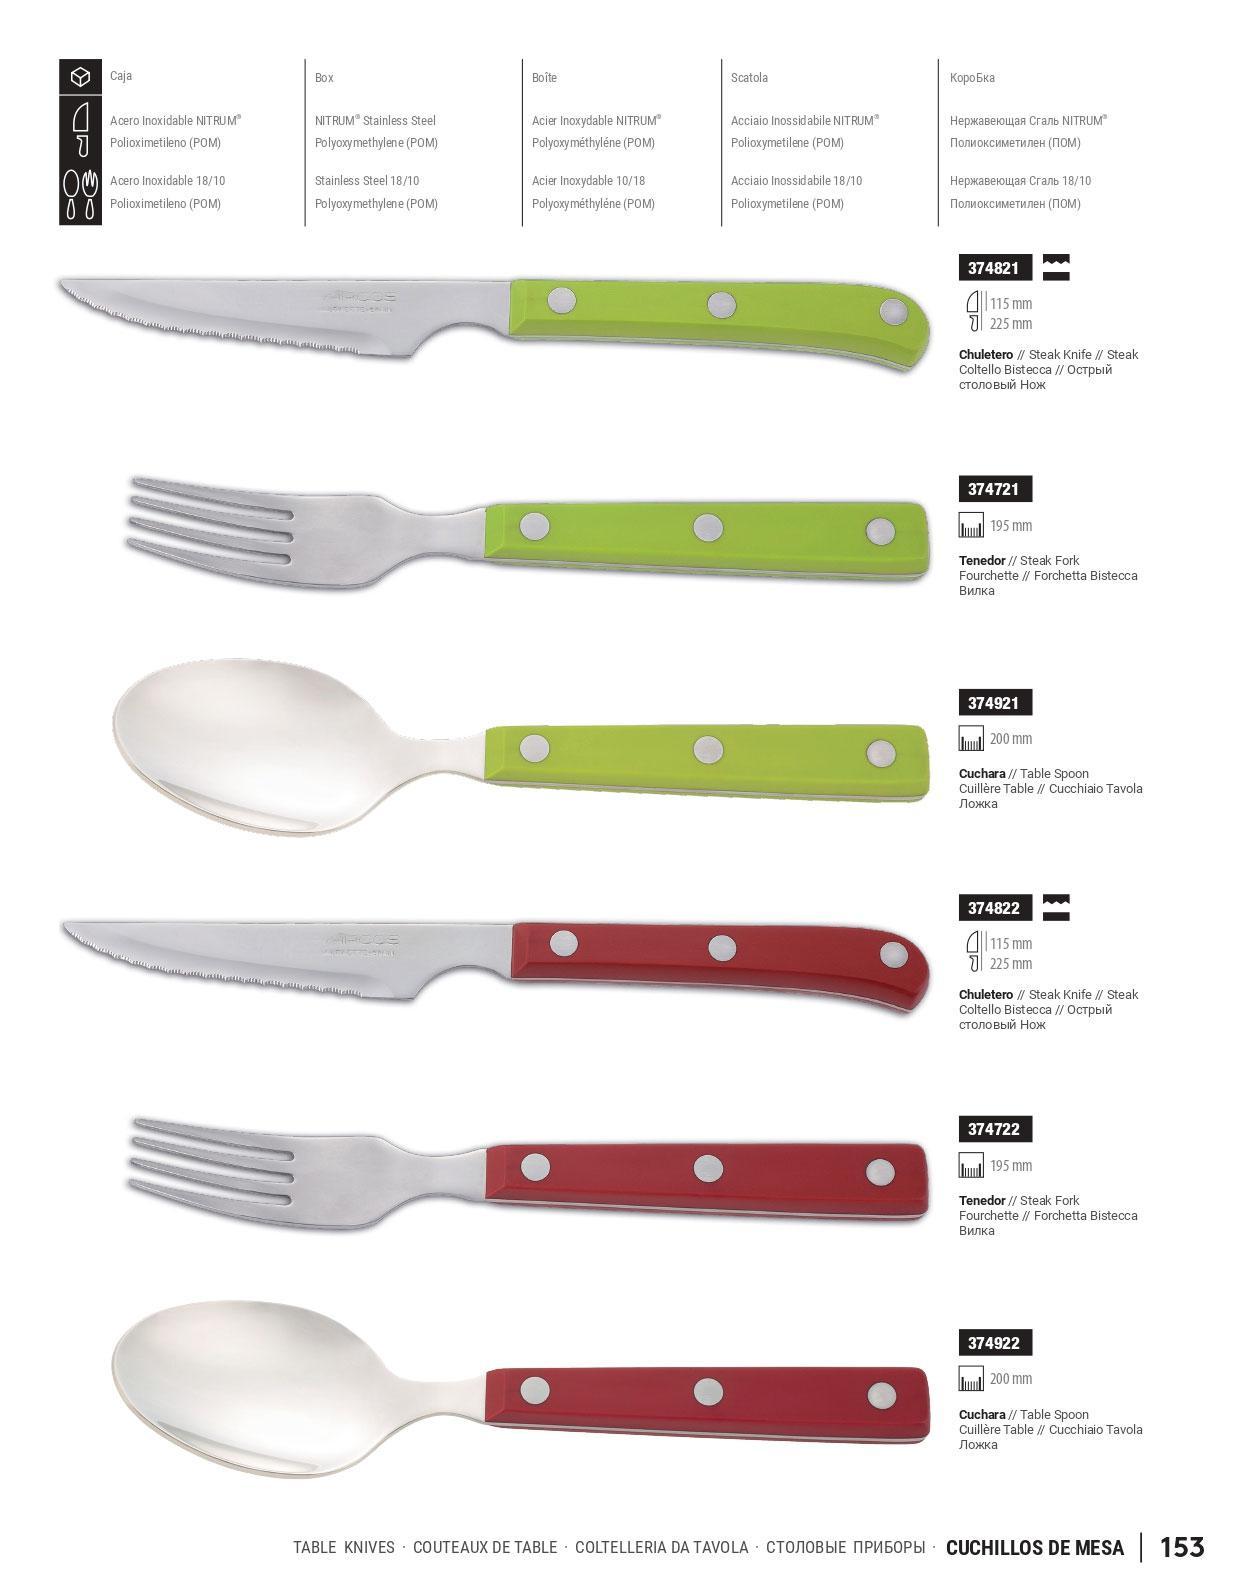 374825 cuchillos de mesa arcos menaje cocina cuchillos cocina cuchilleria albacete - Cuchillos de cocina arcos ...